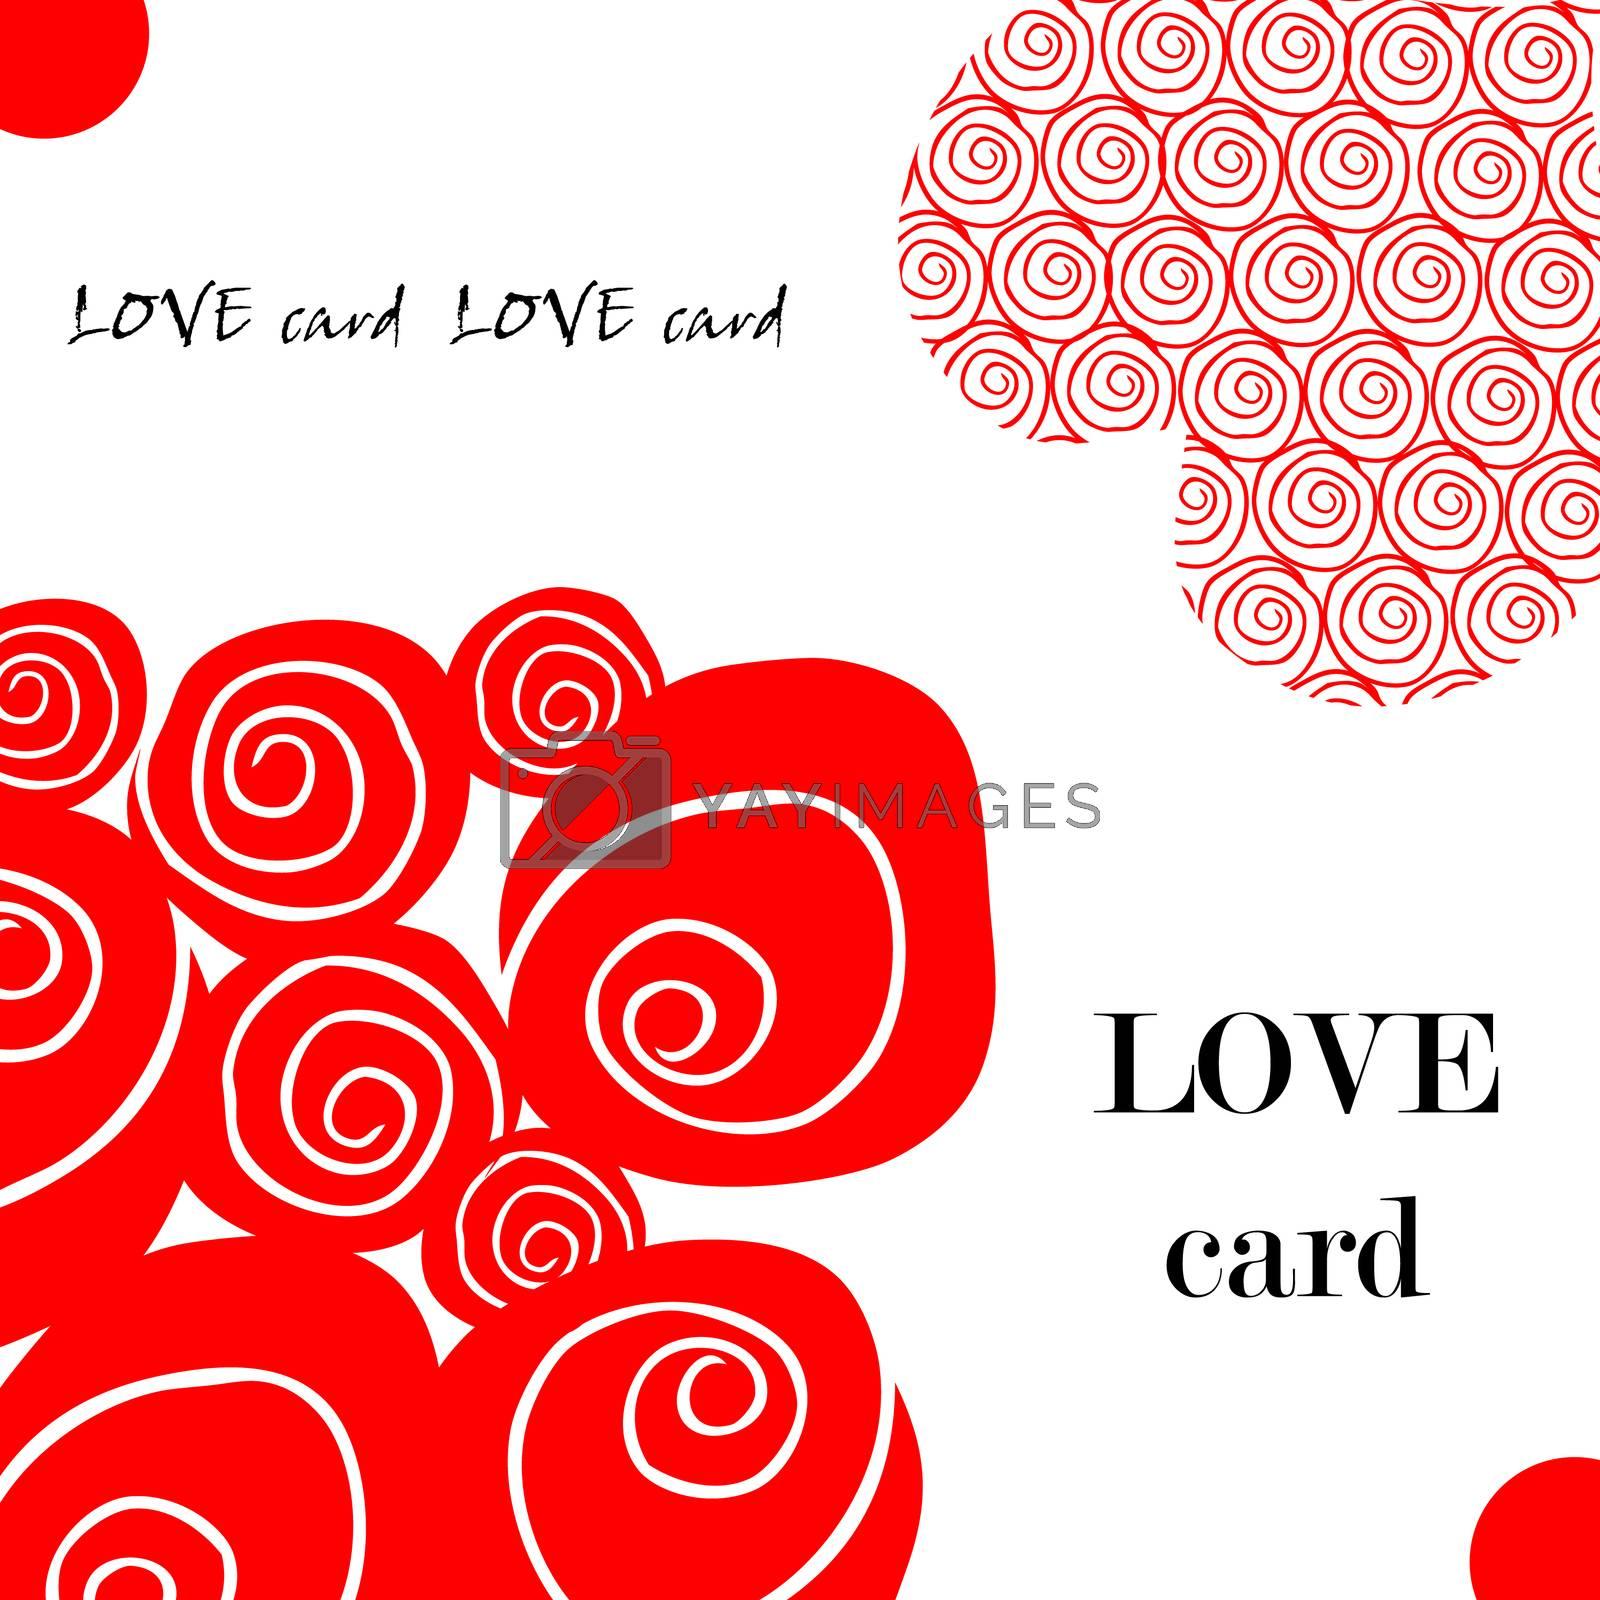 Love fake paper card, heart, flower, valentin's day